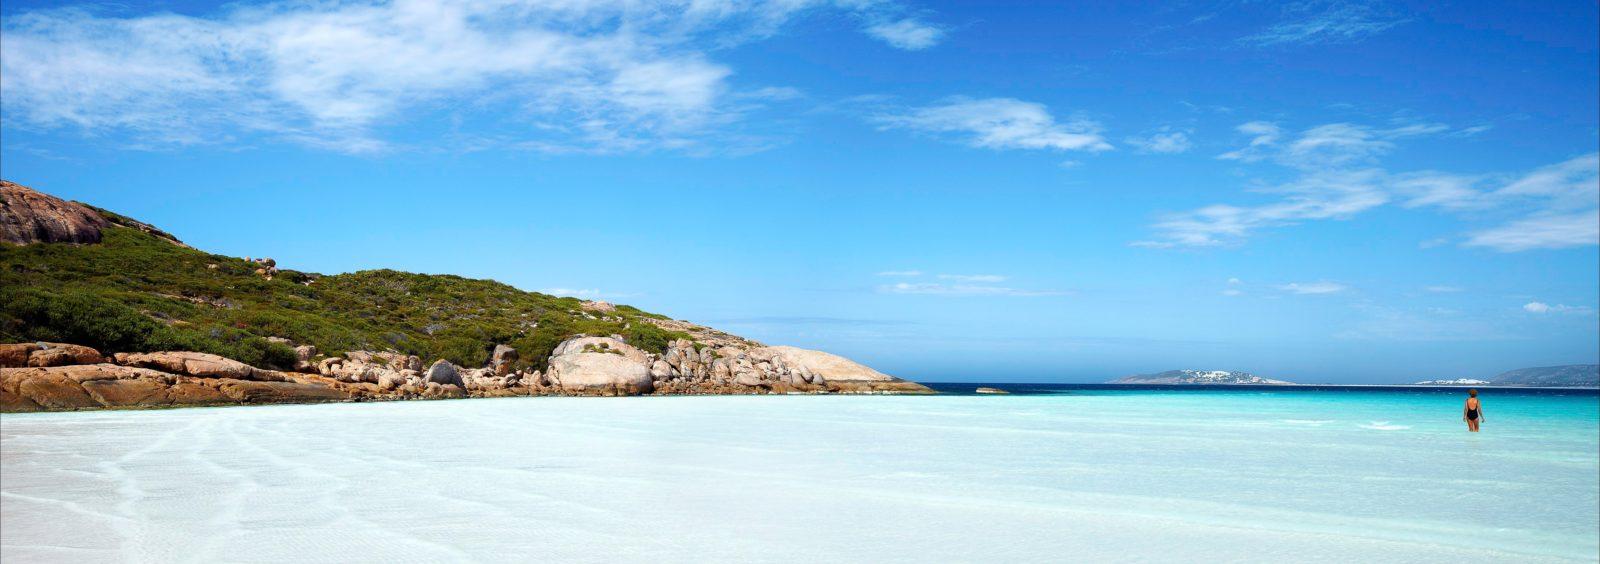 Duke of Orleans Bay, Condingup, Western Australia